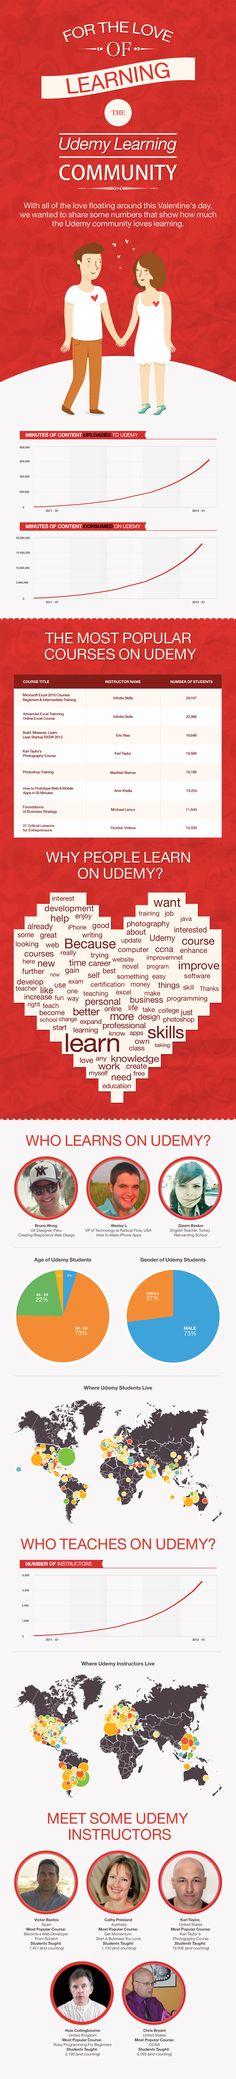 Udemy Statistics Infographic: Growth, Popular Courses, Student & Teacher Demographics